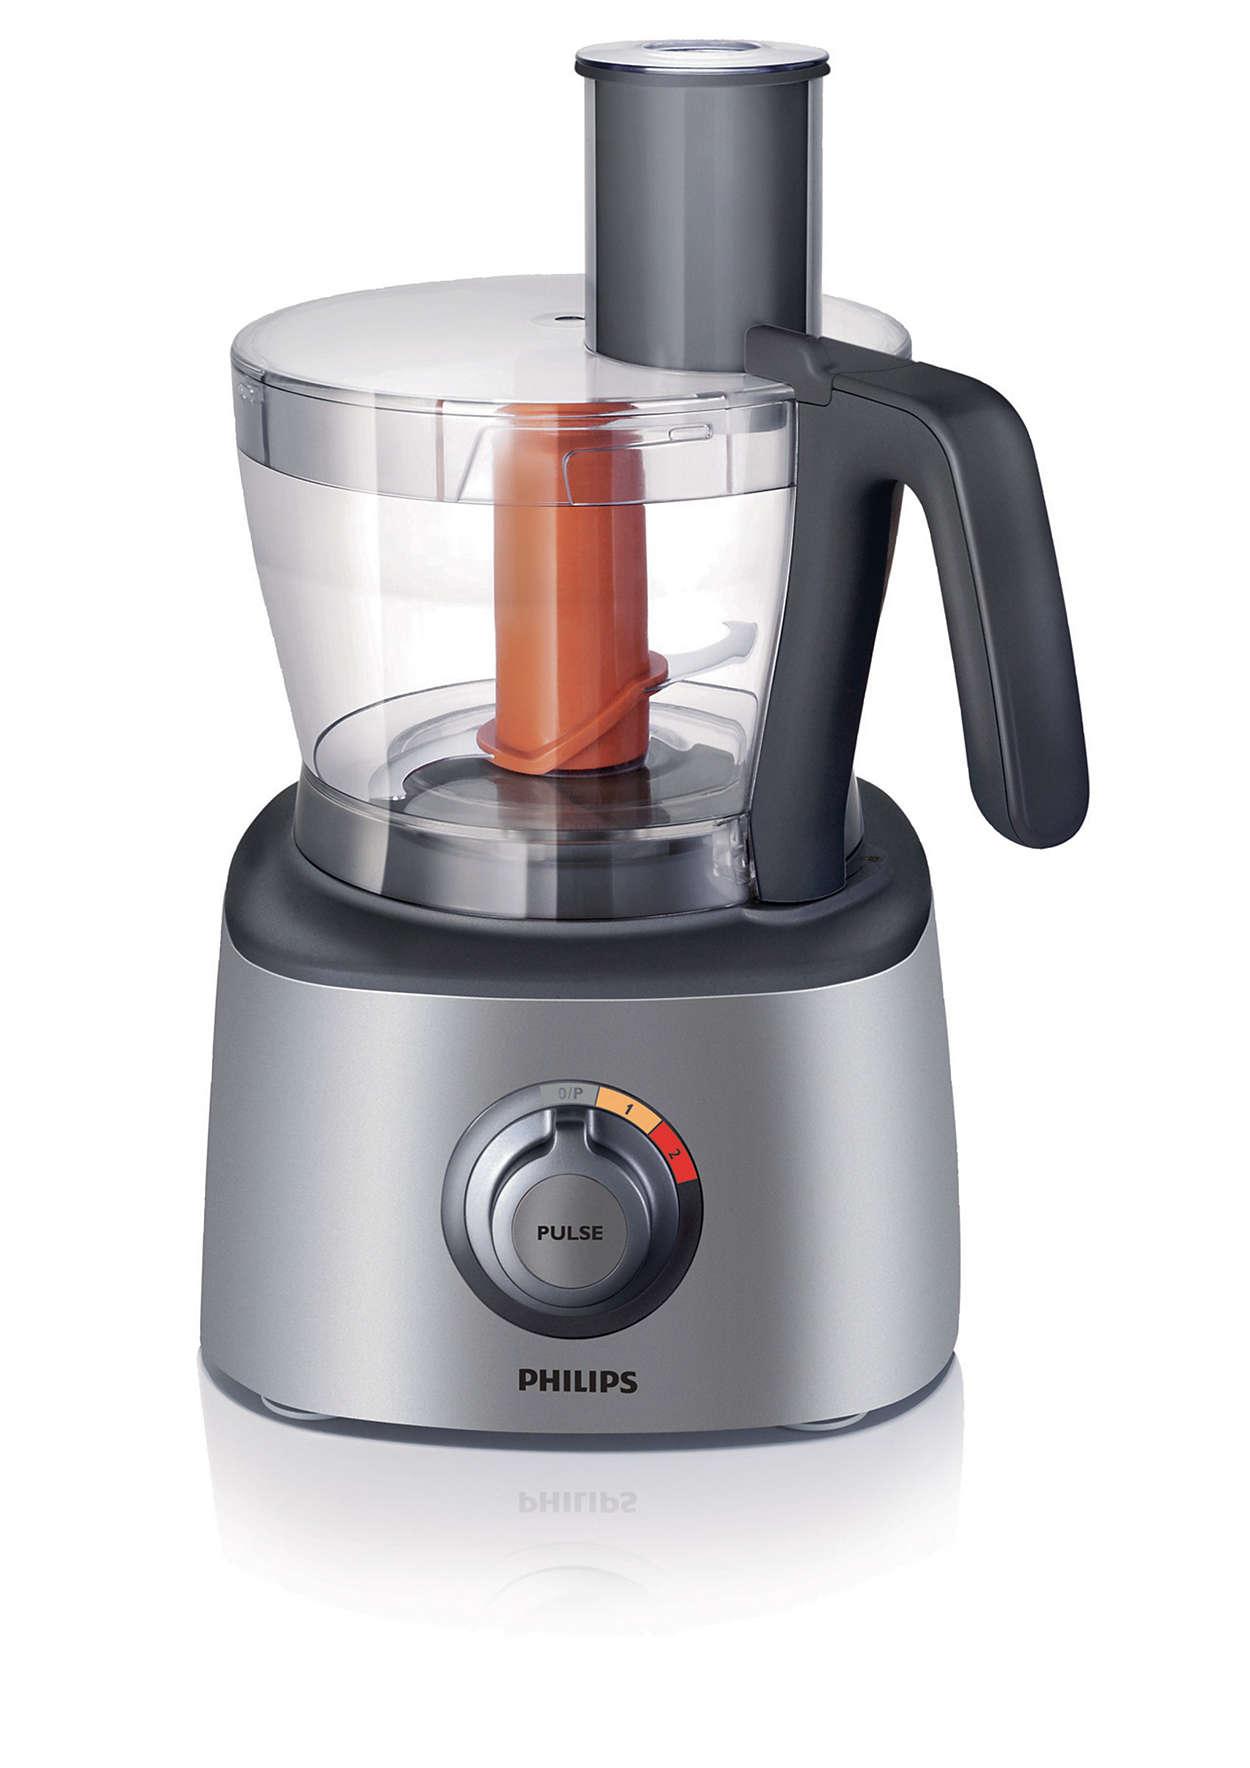 Robot de cocina hr7771 53 philips - Philips robot cocina ...